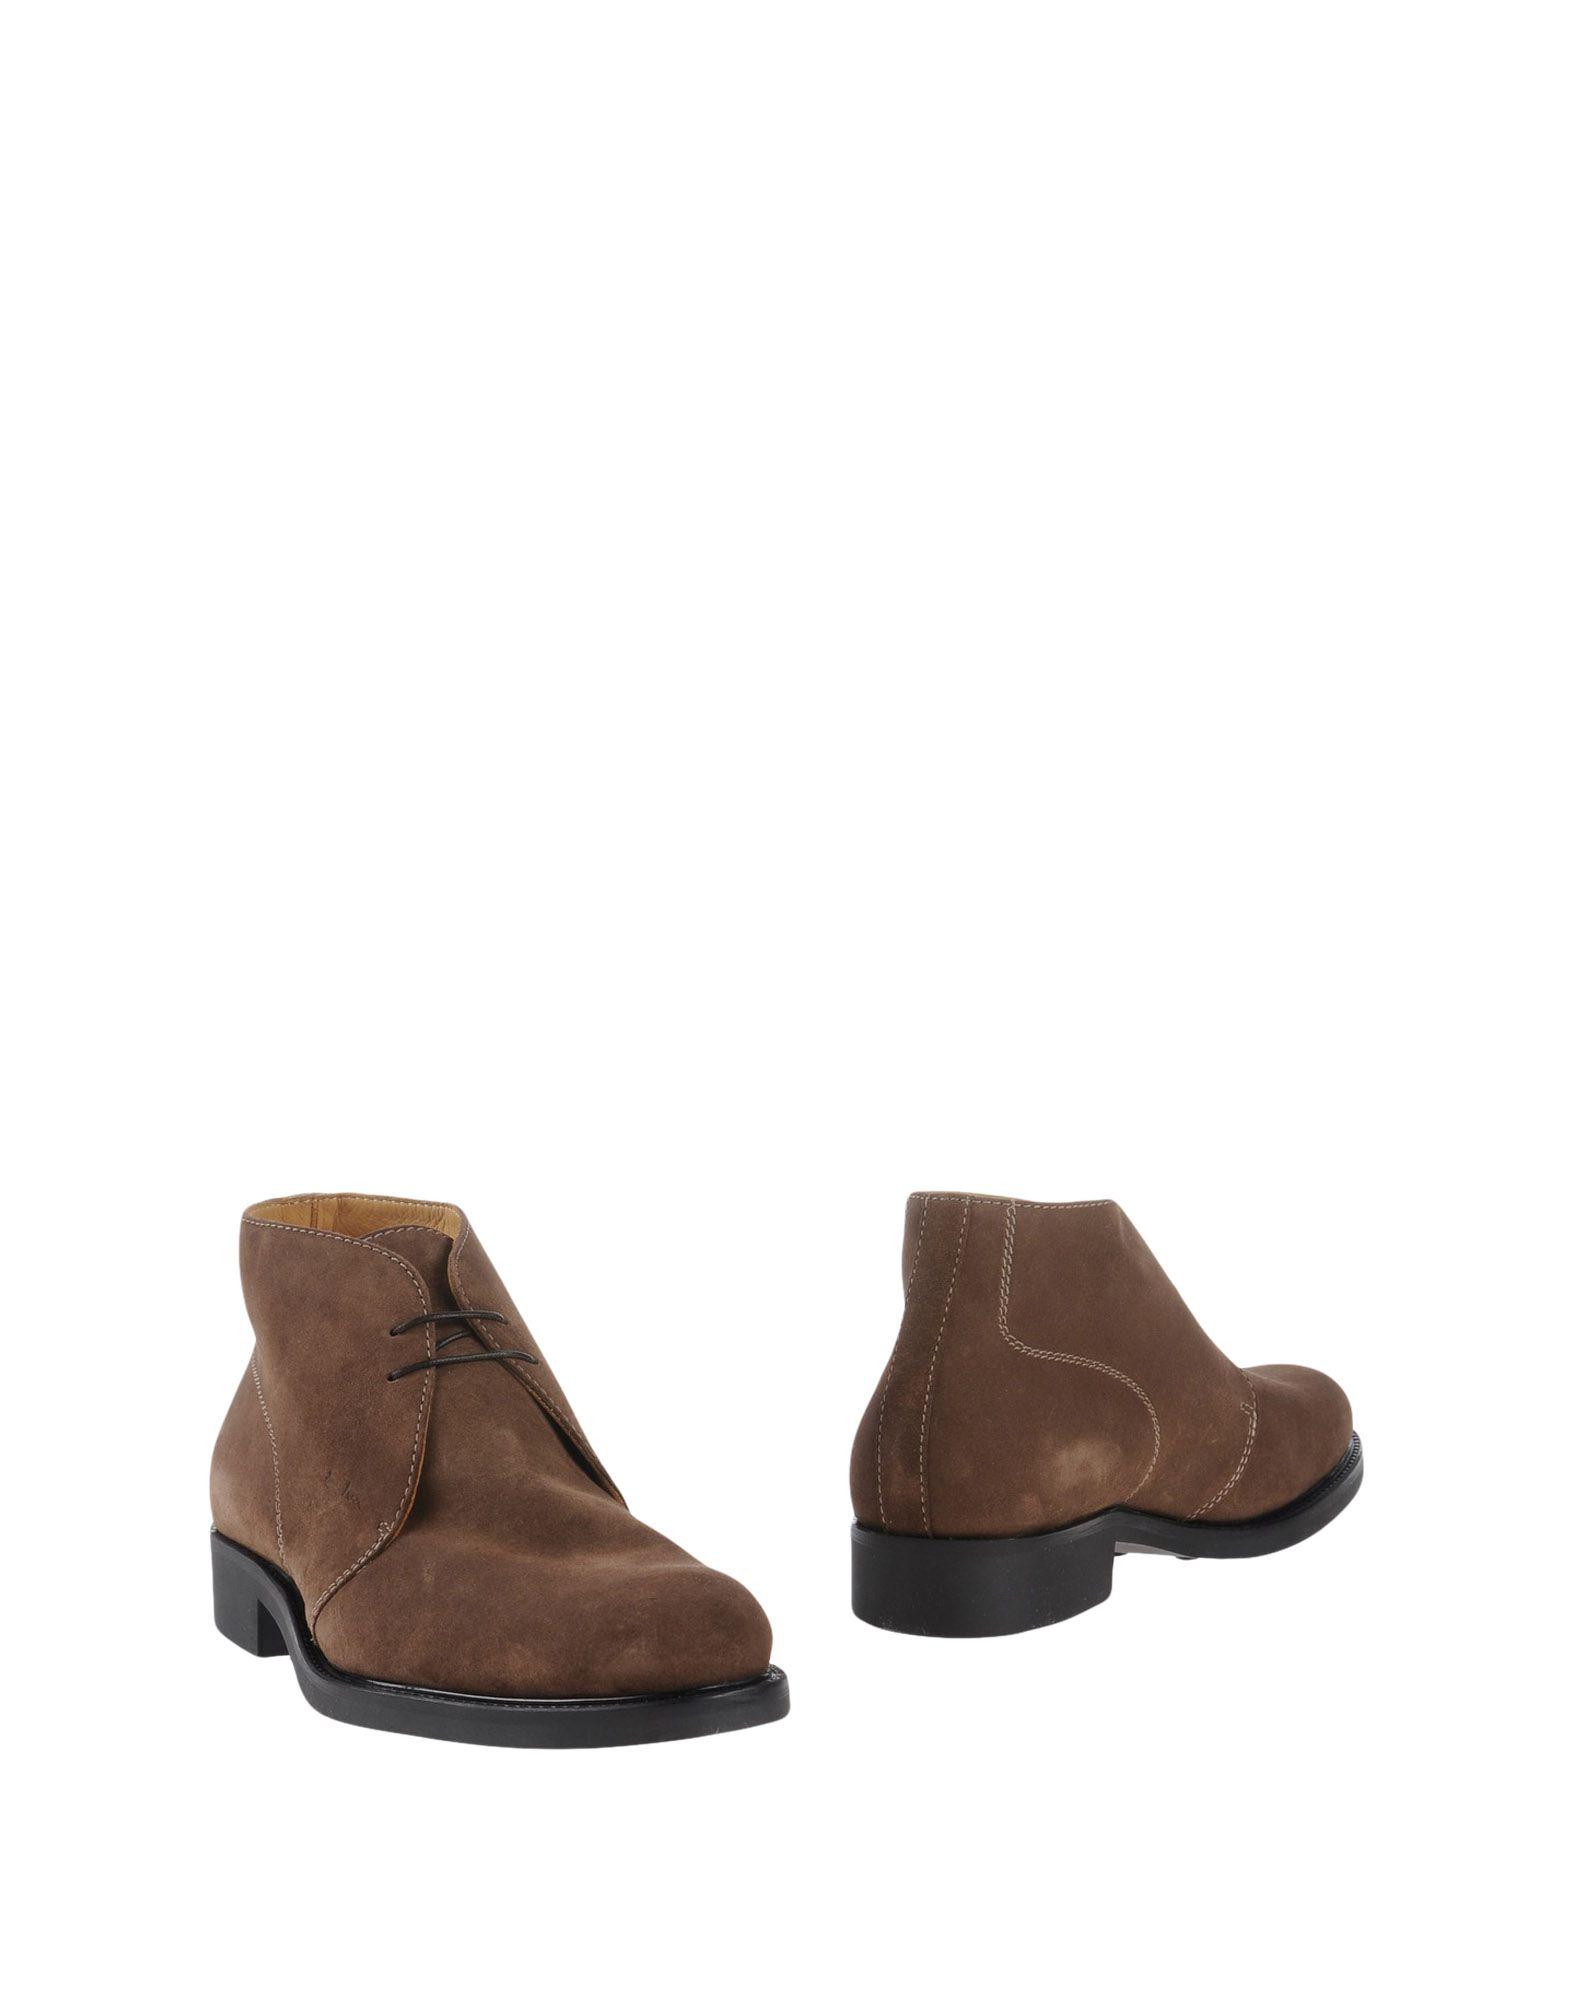 Rabatt echte Schuhe Herren Emanuele Monti Stiefelette Herren Schuhe  11098340EW 8bd2d7